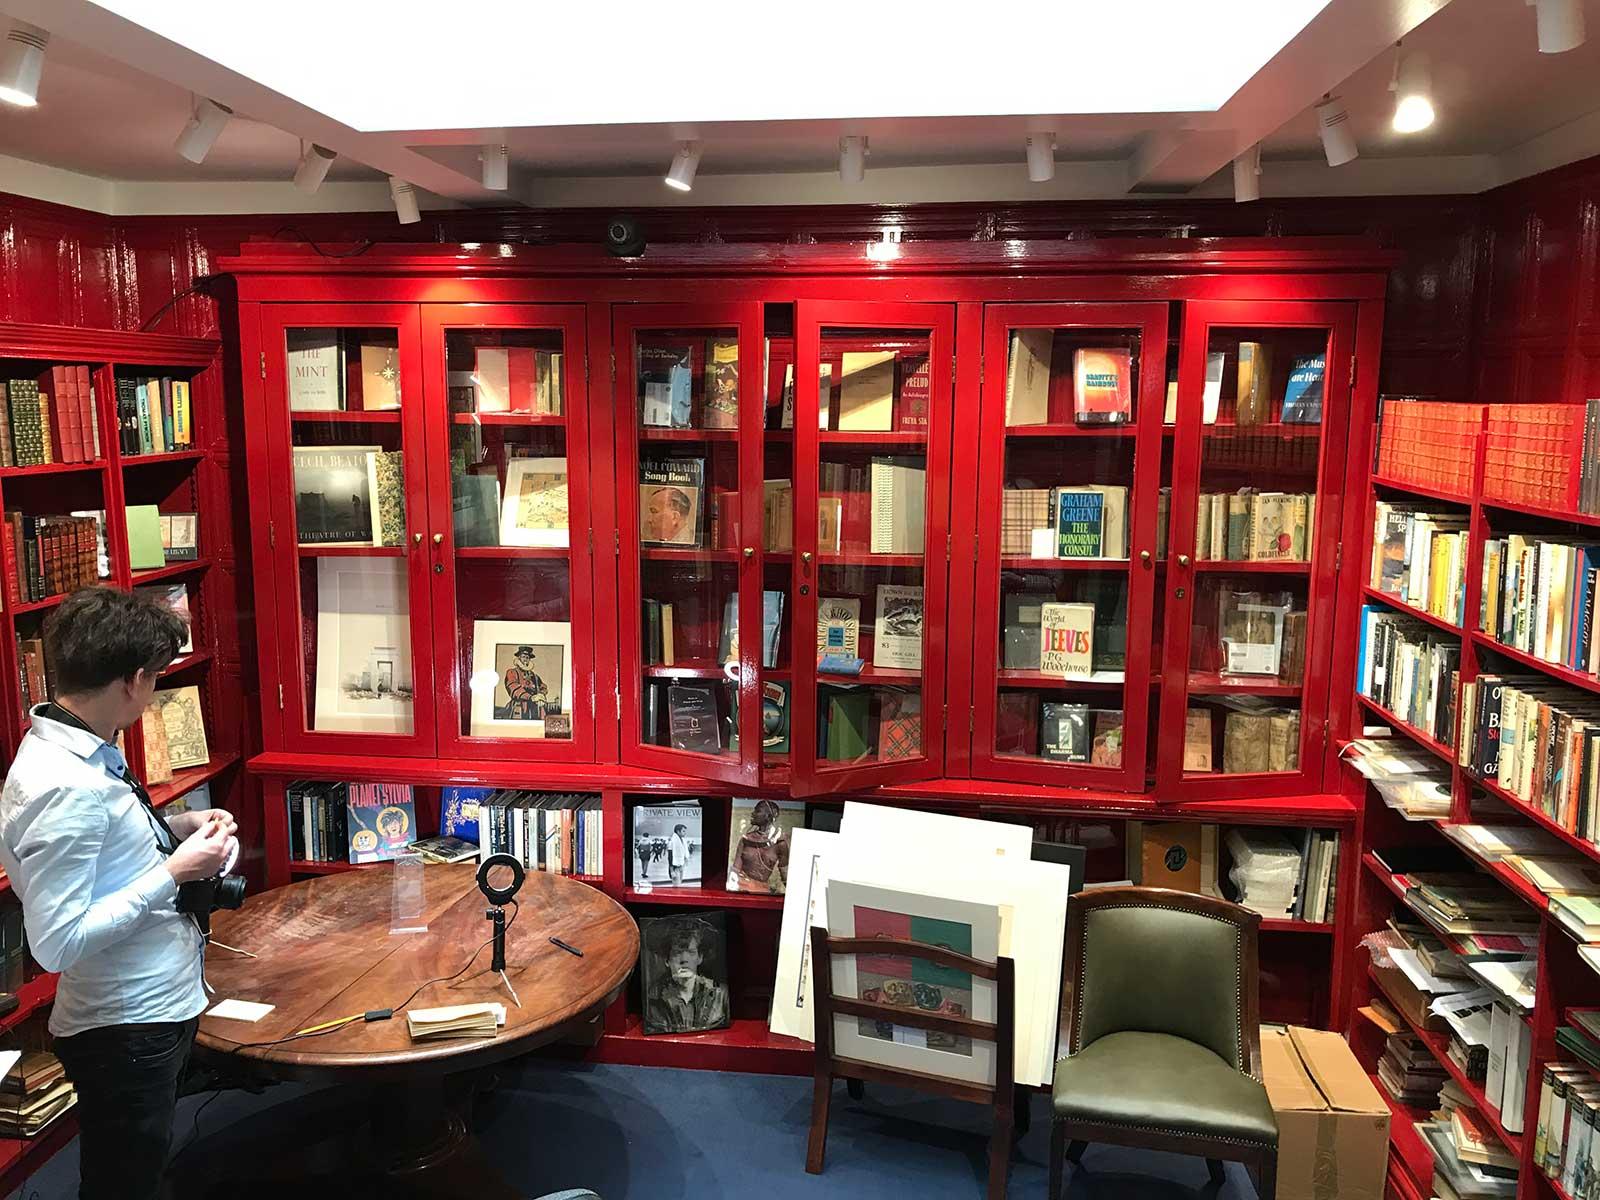 Calder Bookshop and Theatre